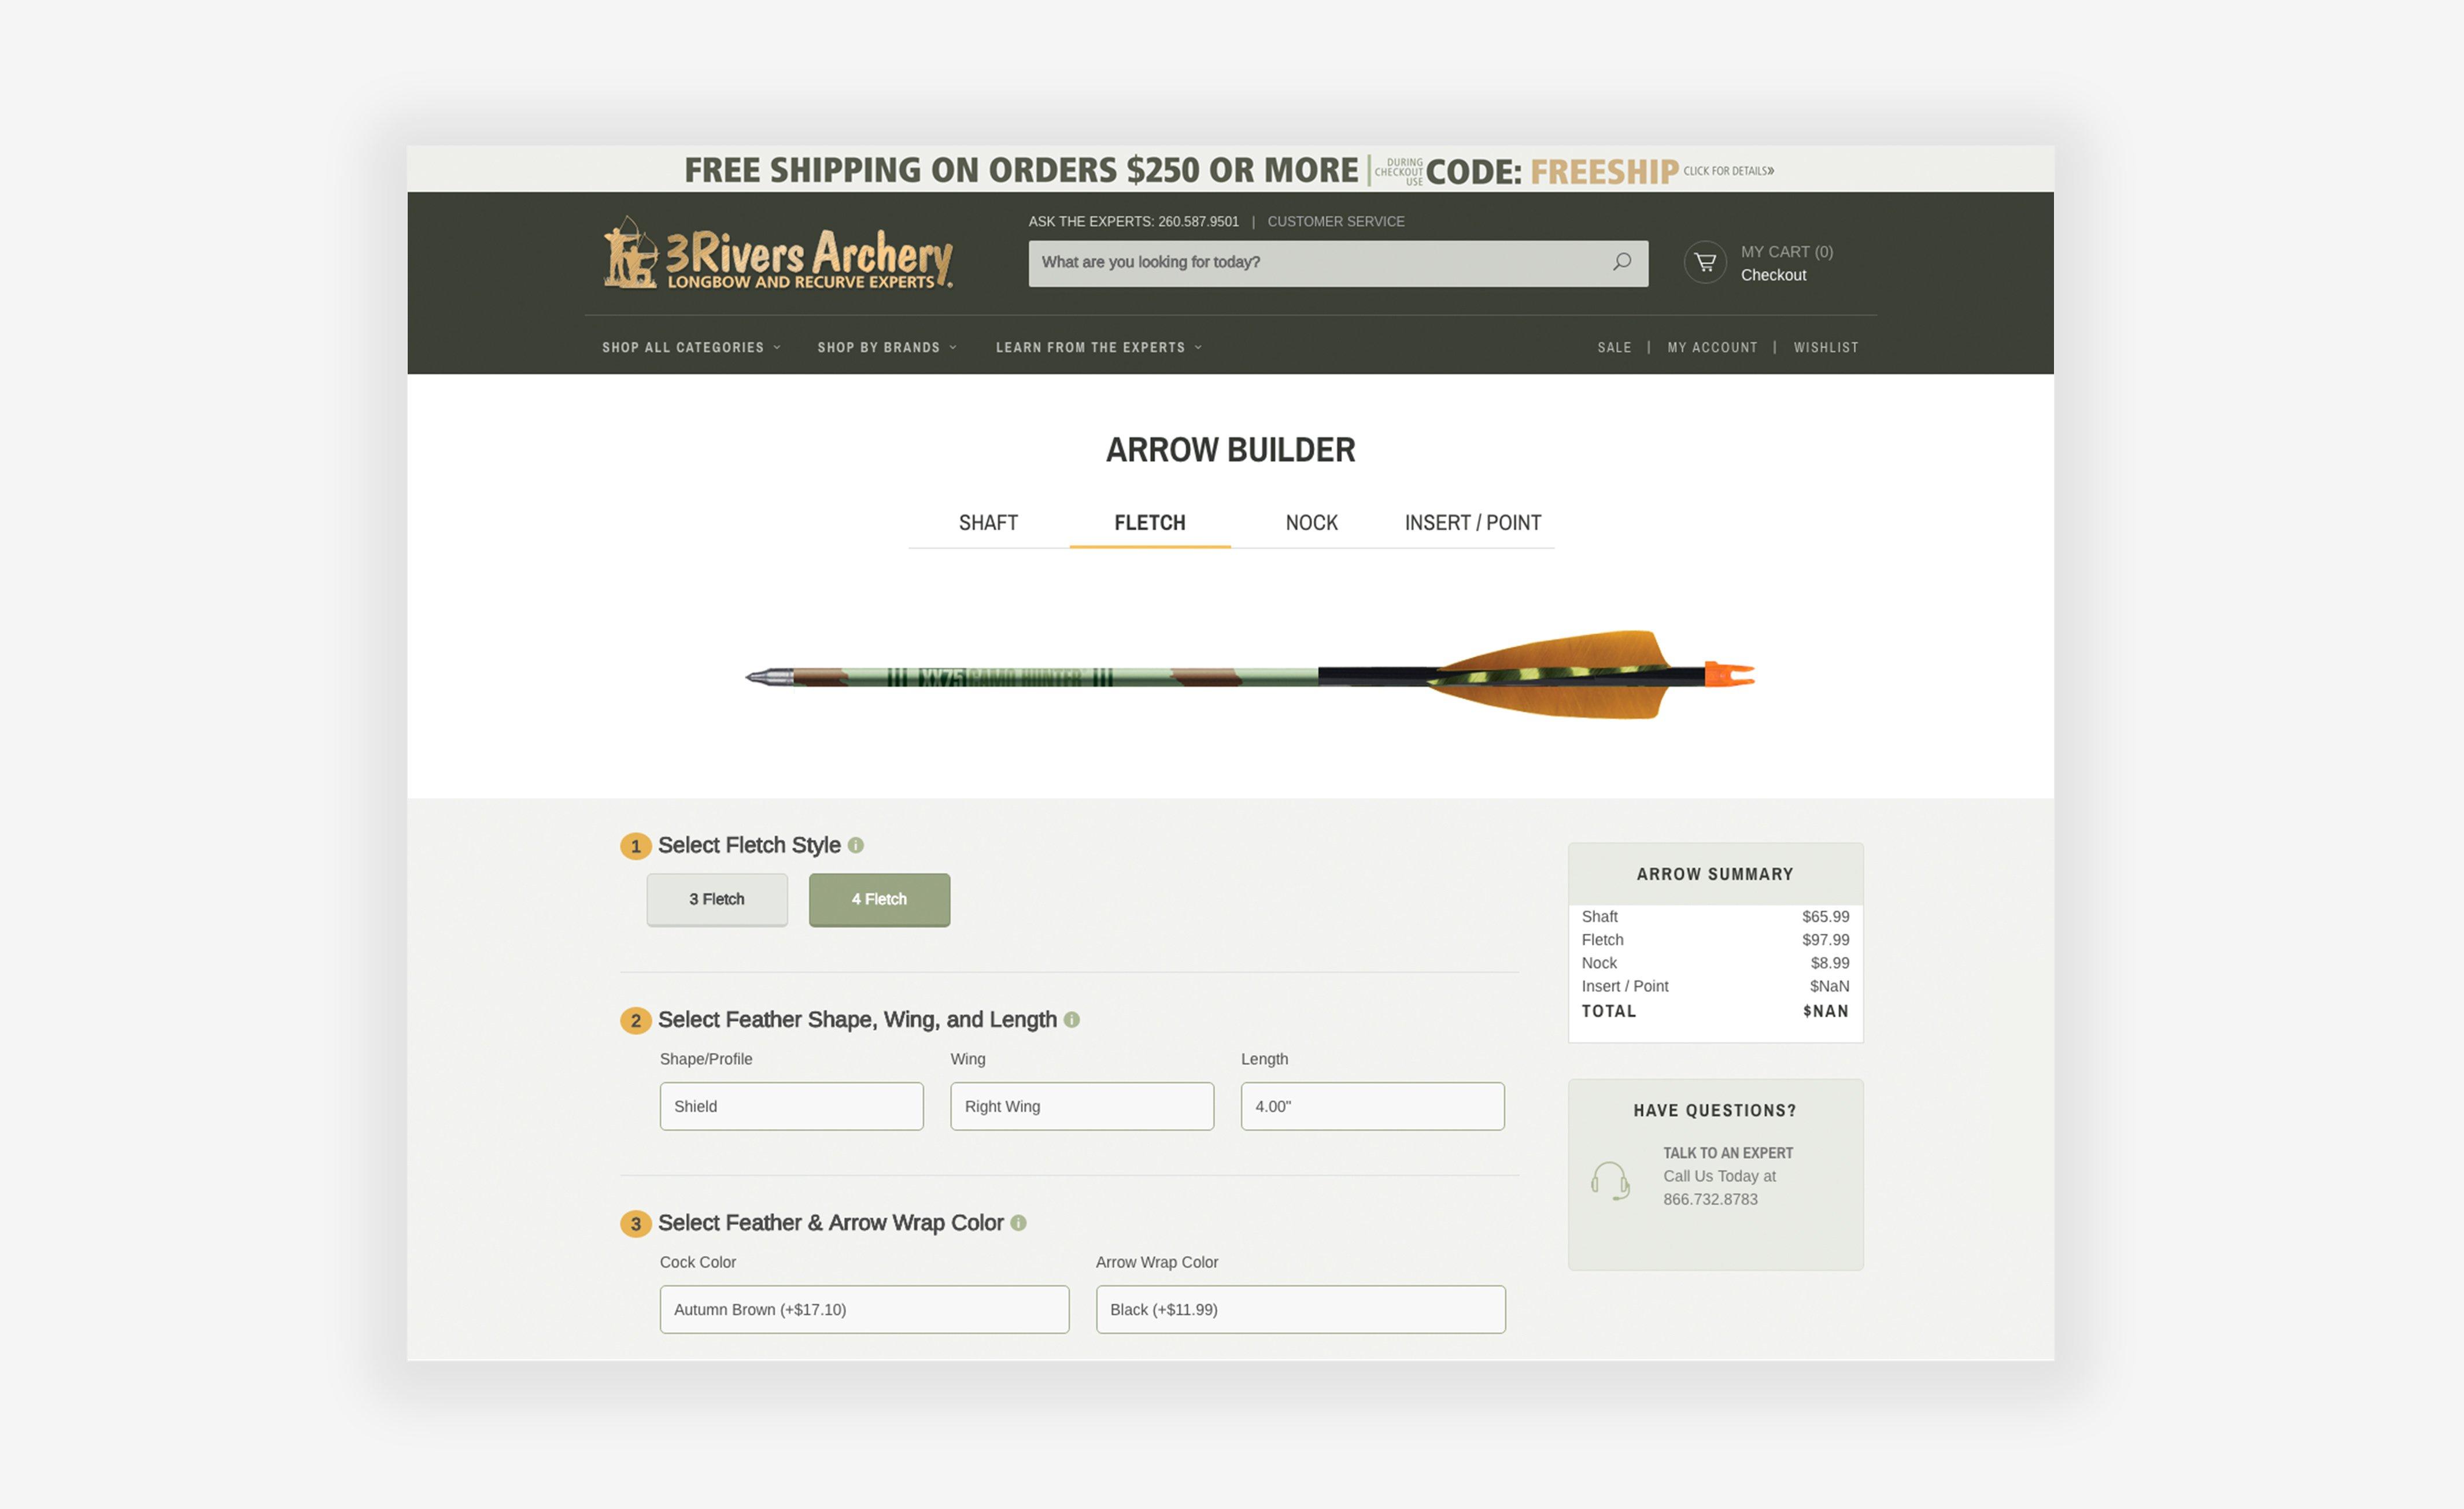 1805-3Rivers-Archery--ARROW-BUILDER